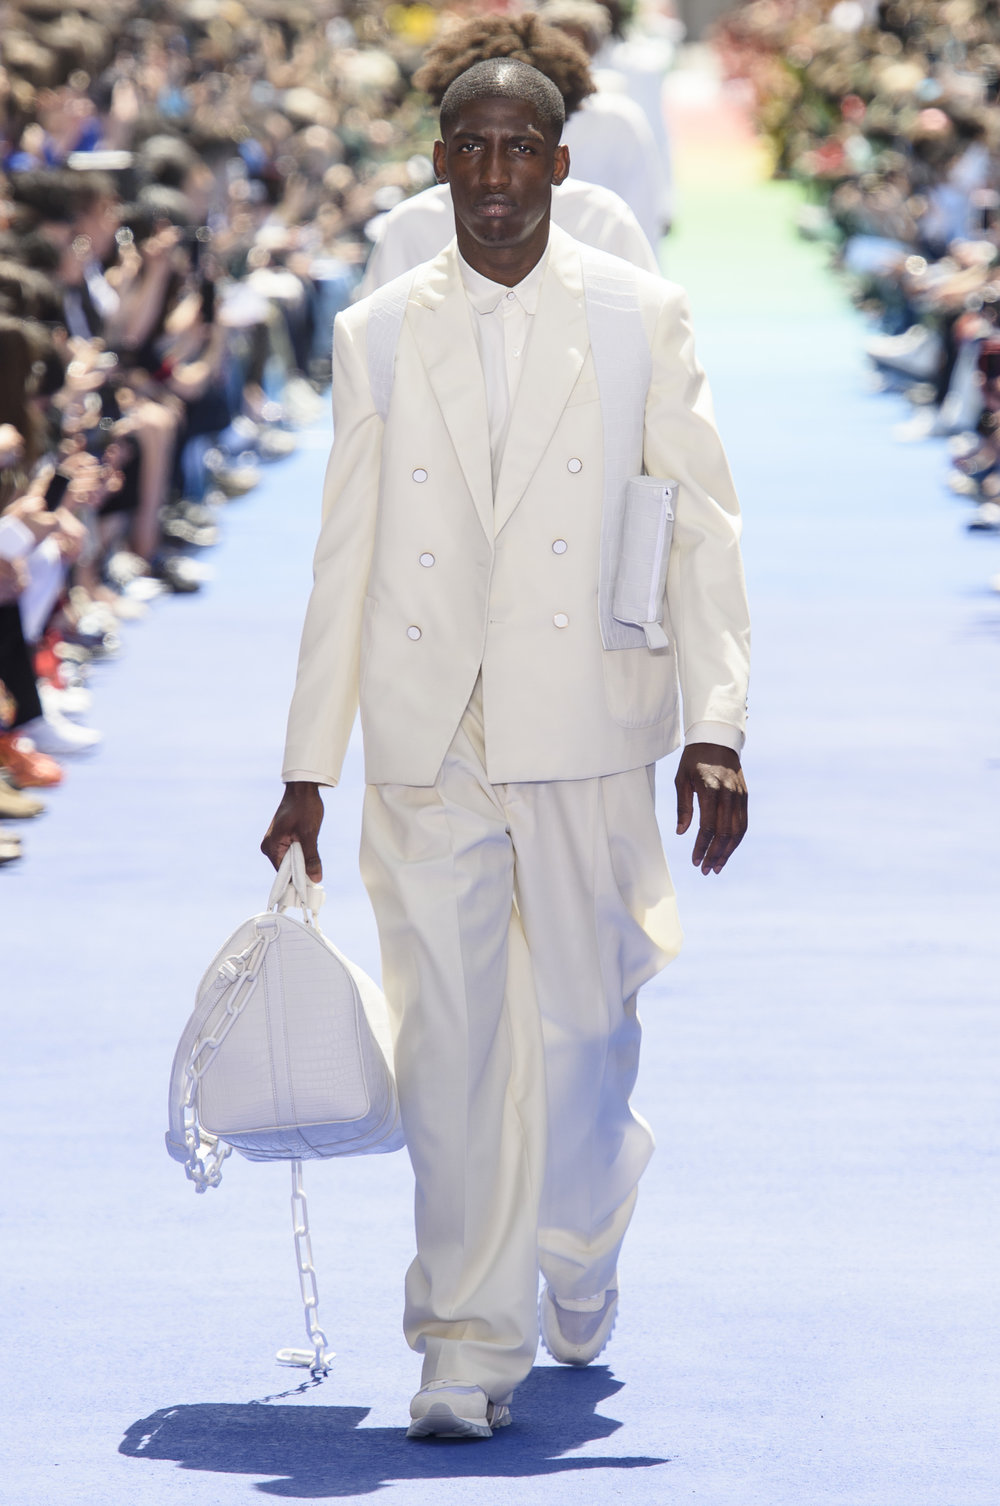 01_Louis_Vuitton_original_vui_prs_ss19_004.jpg